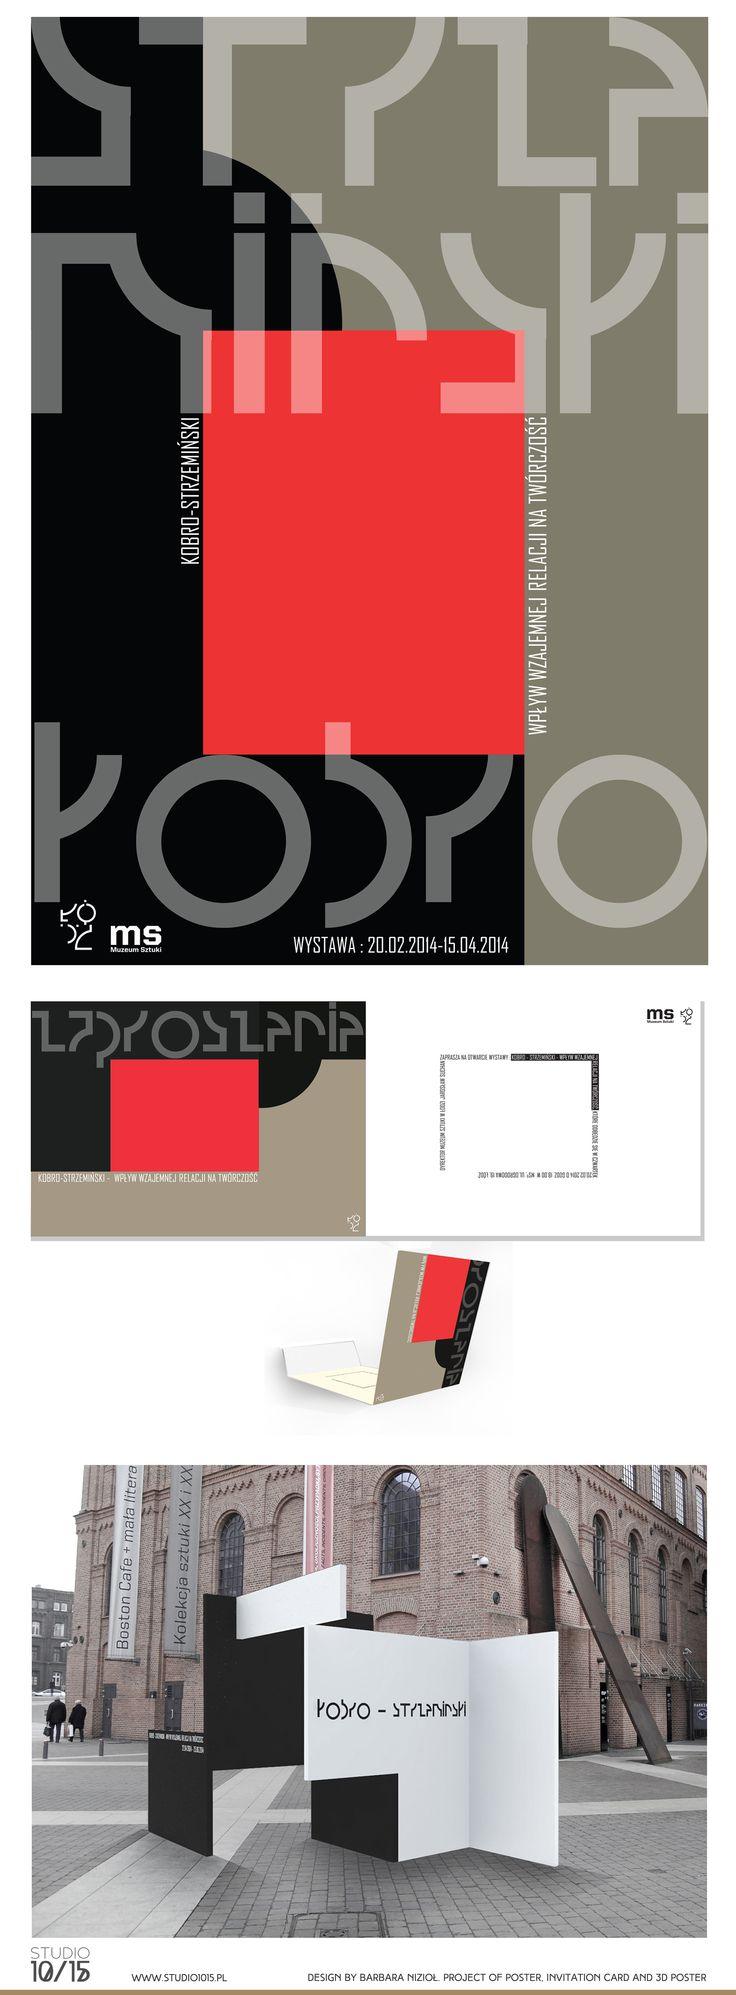 Design by Barbara Nizioł. Studio 10/15. Poster for the exhibition about polish avant-garde artists Strzemiński and Kobro. Student work.